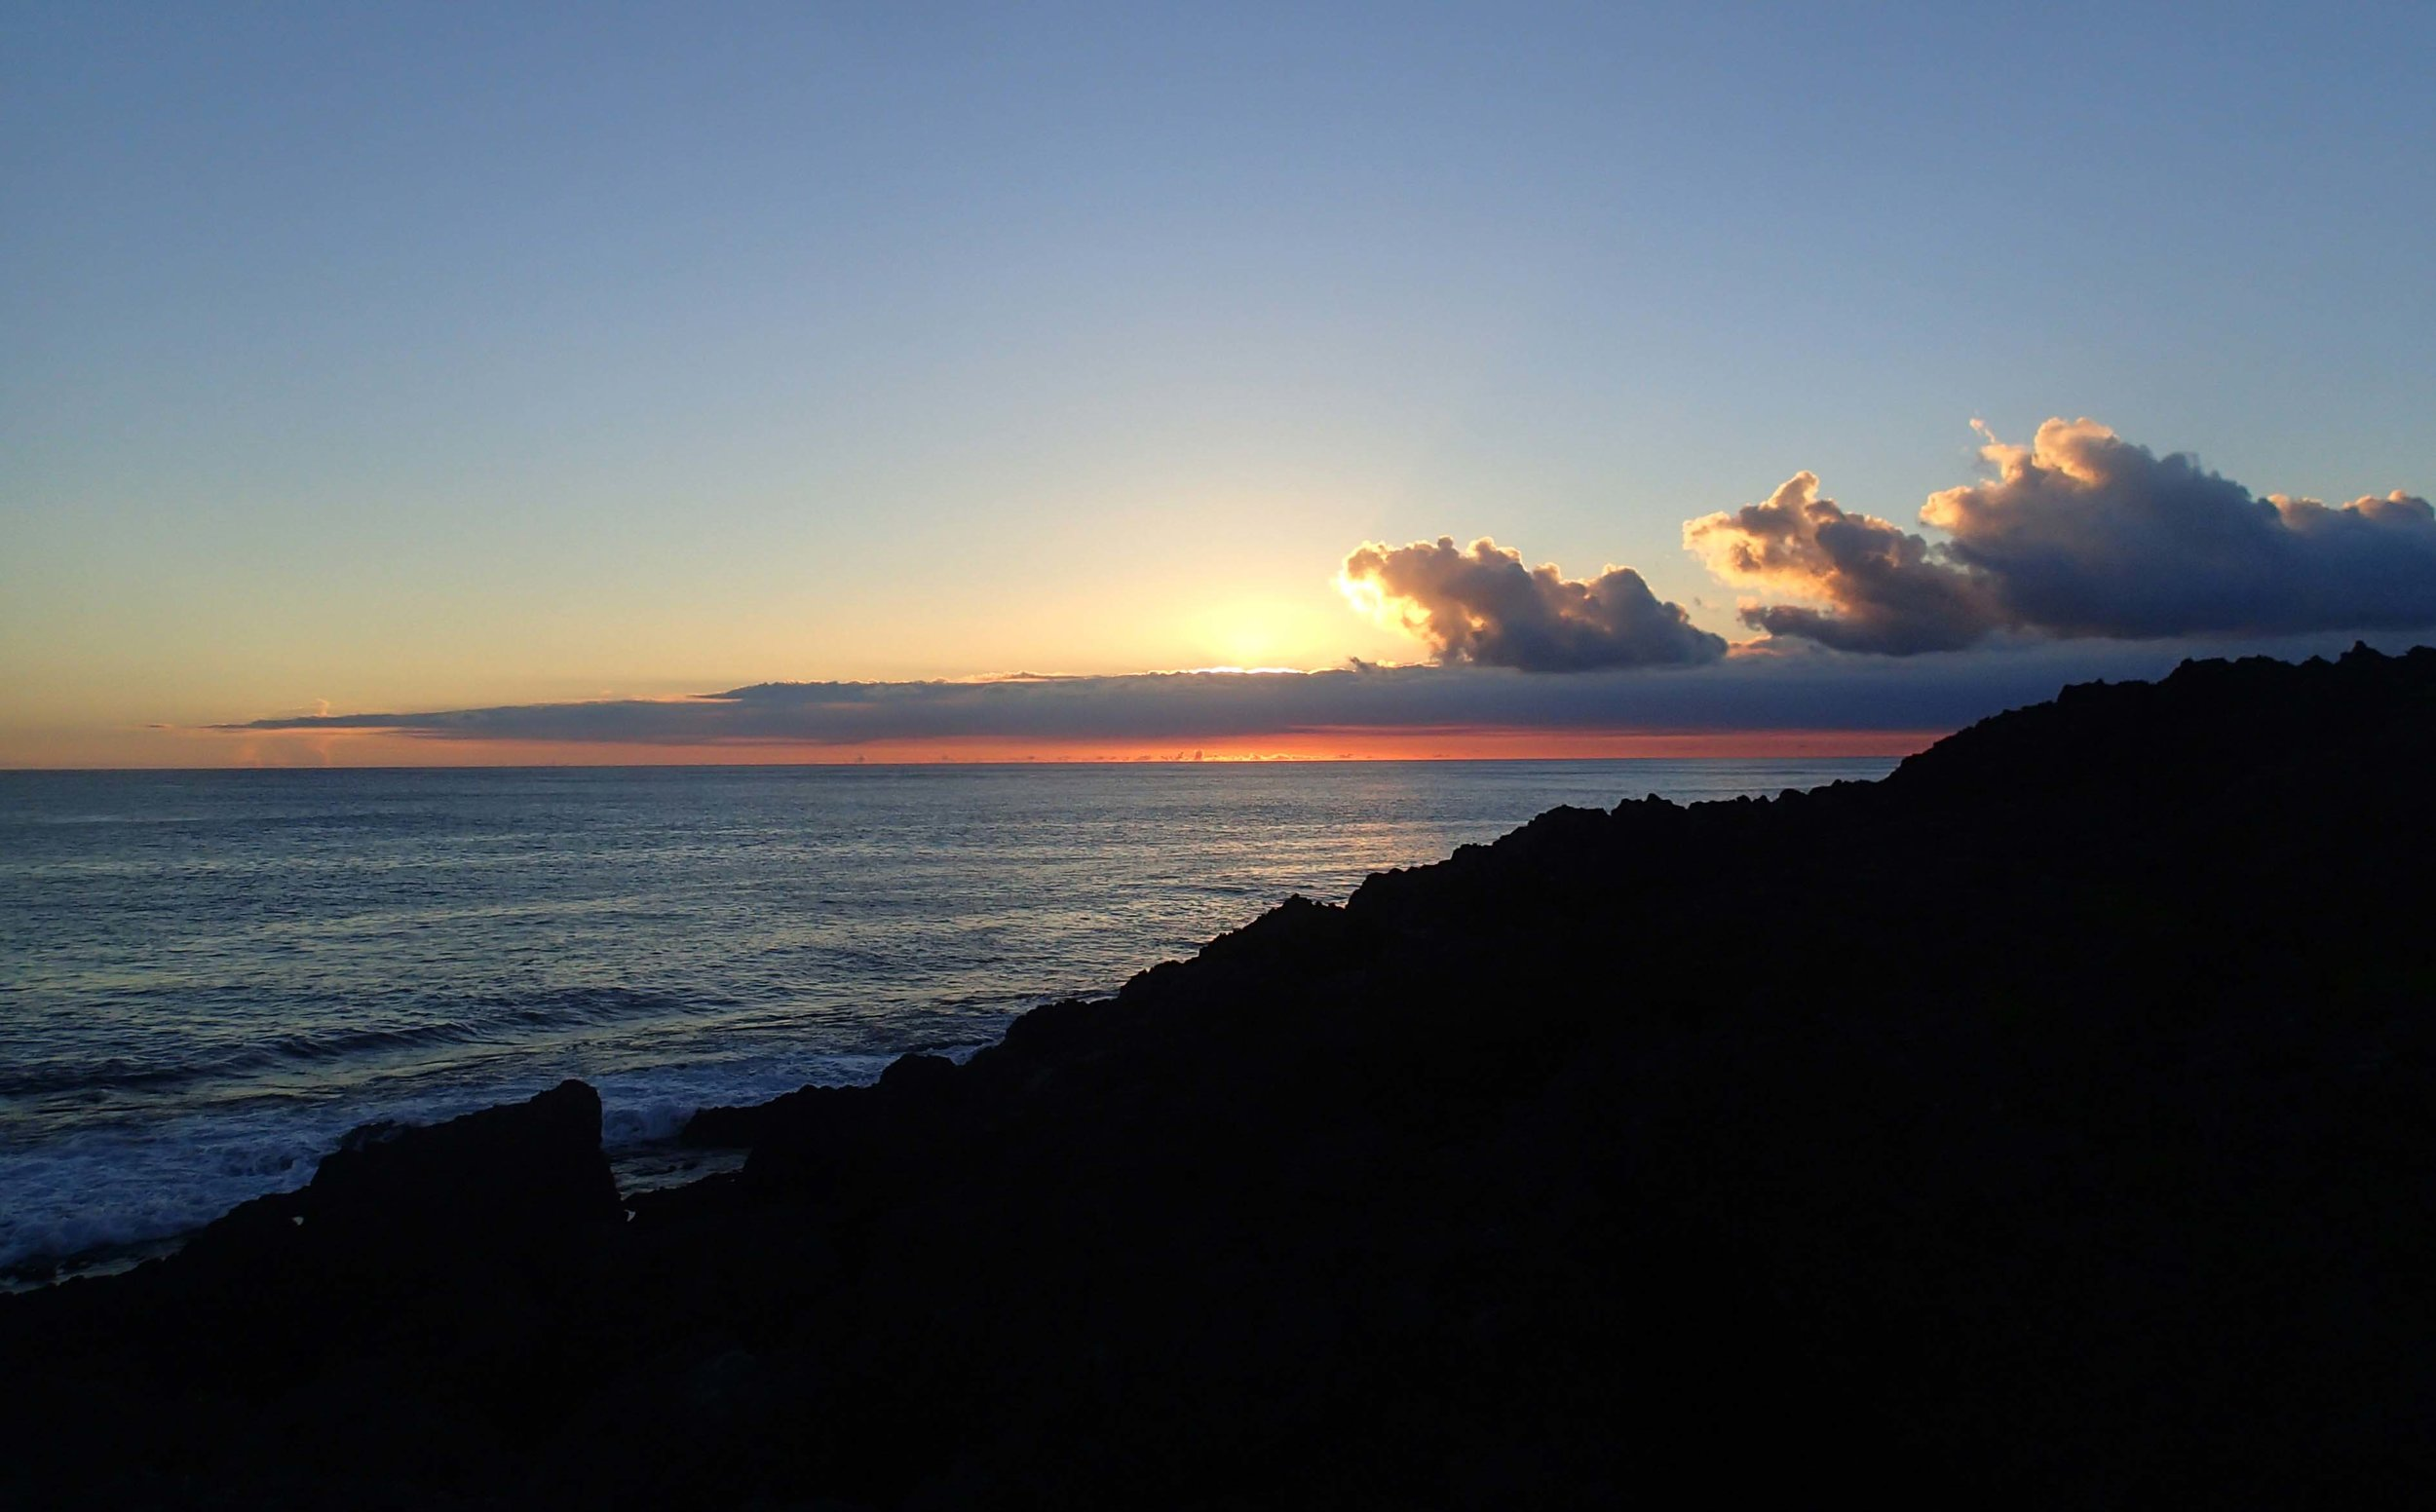 8-26-13 sunset.jpg